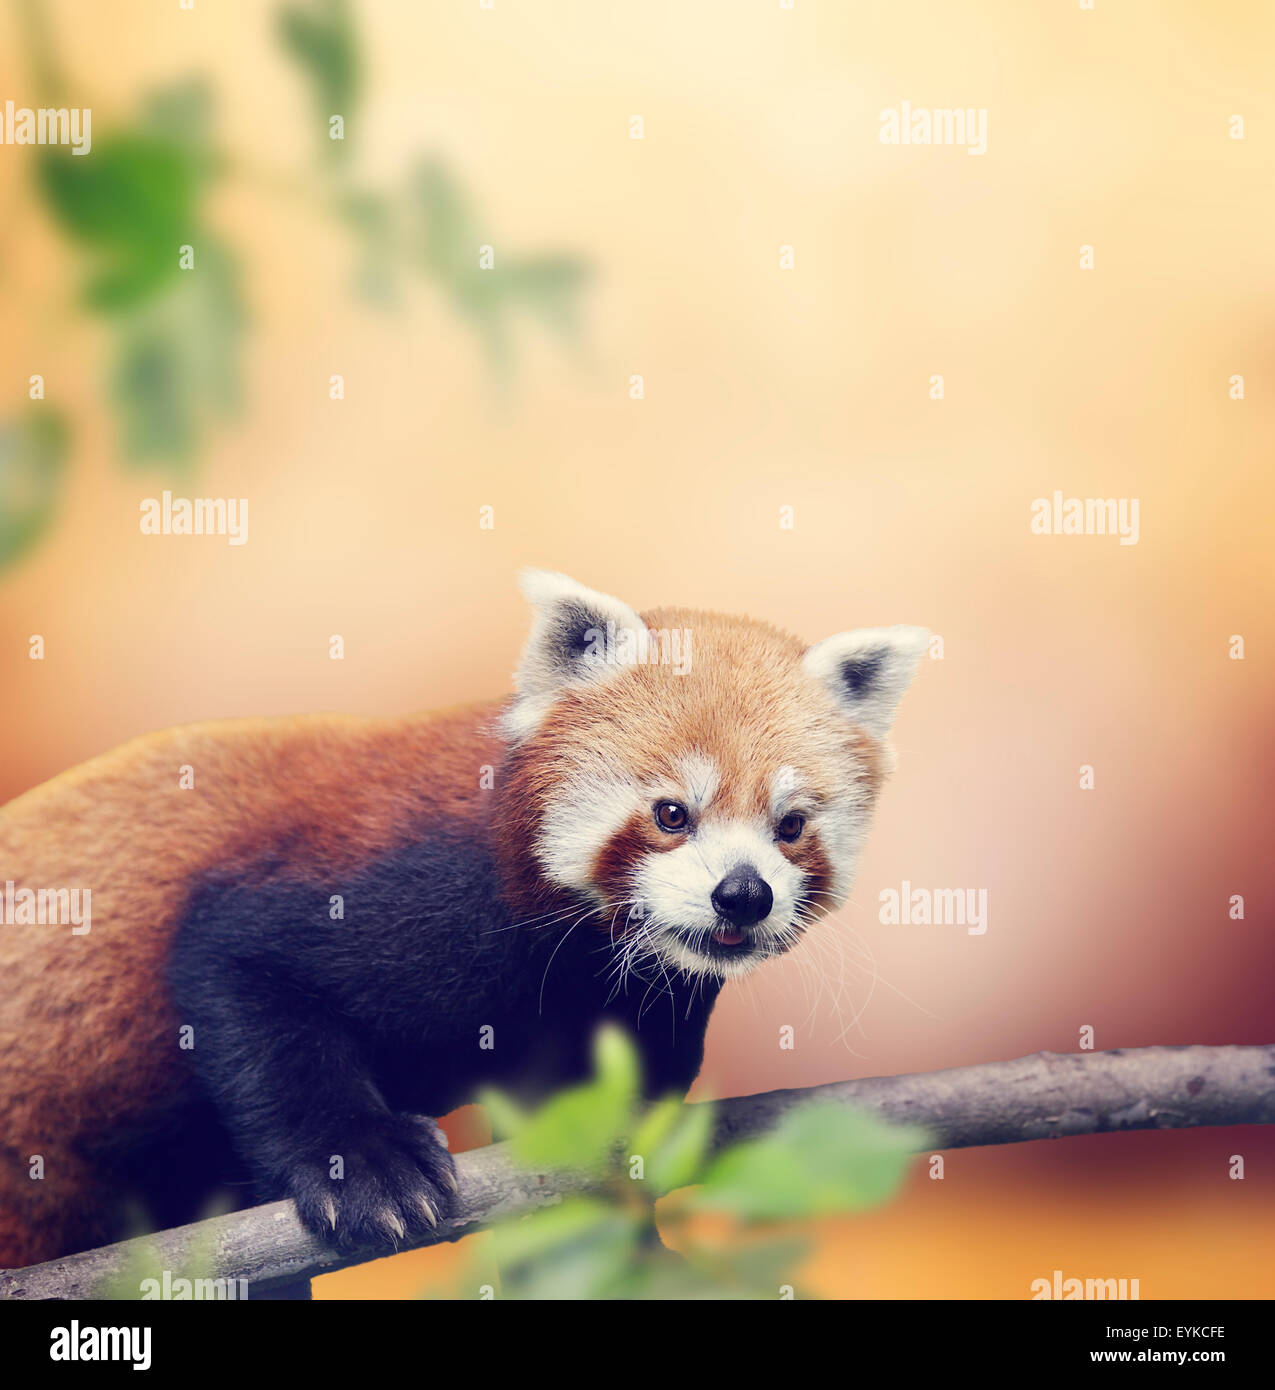 Red Panda Bear Climbing On A Tree - Stock Image